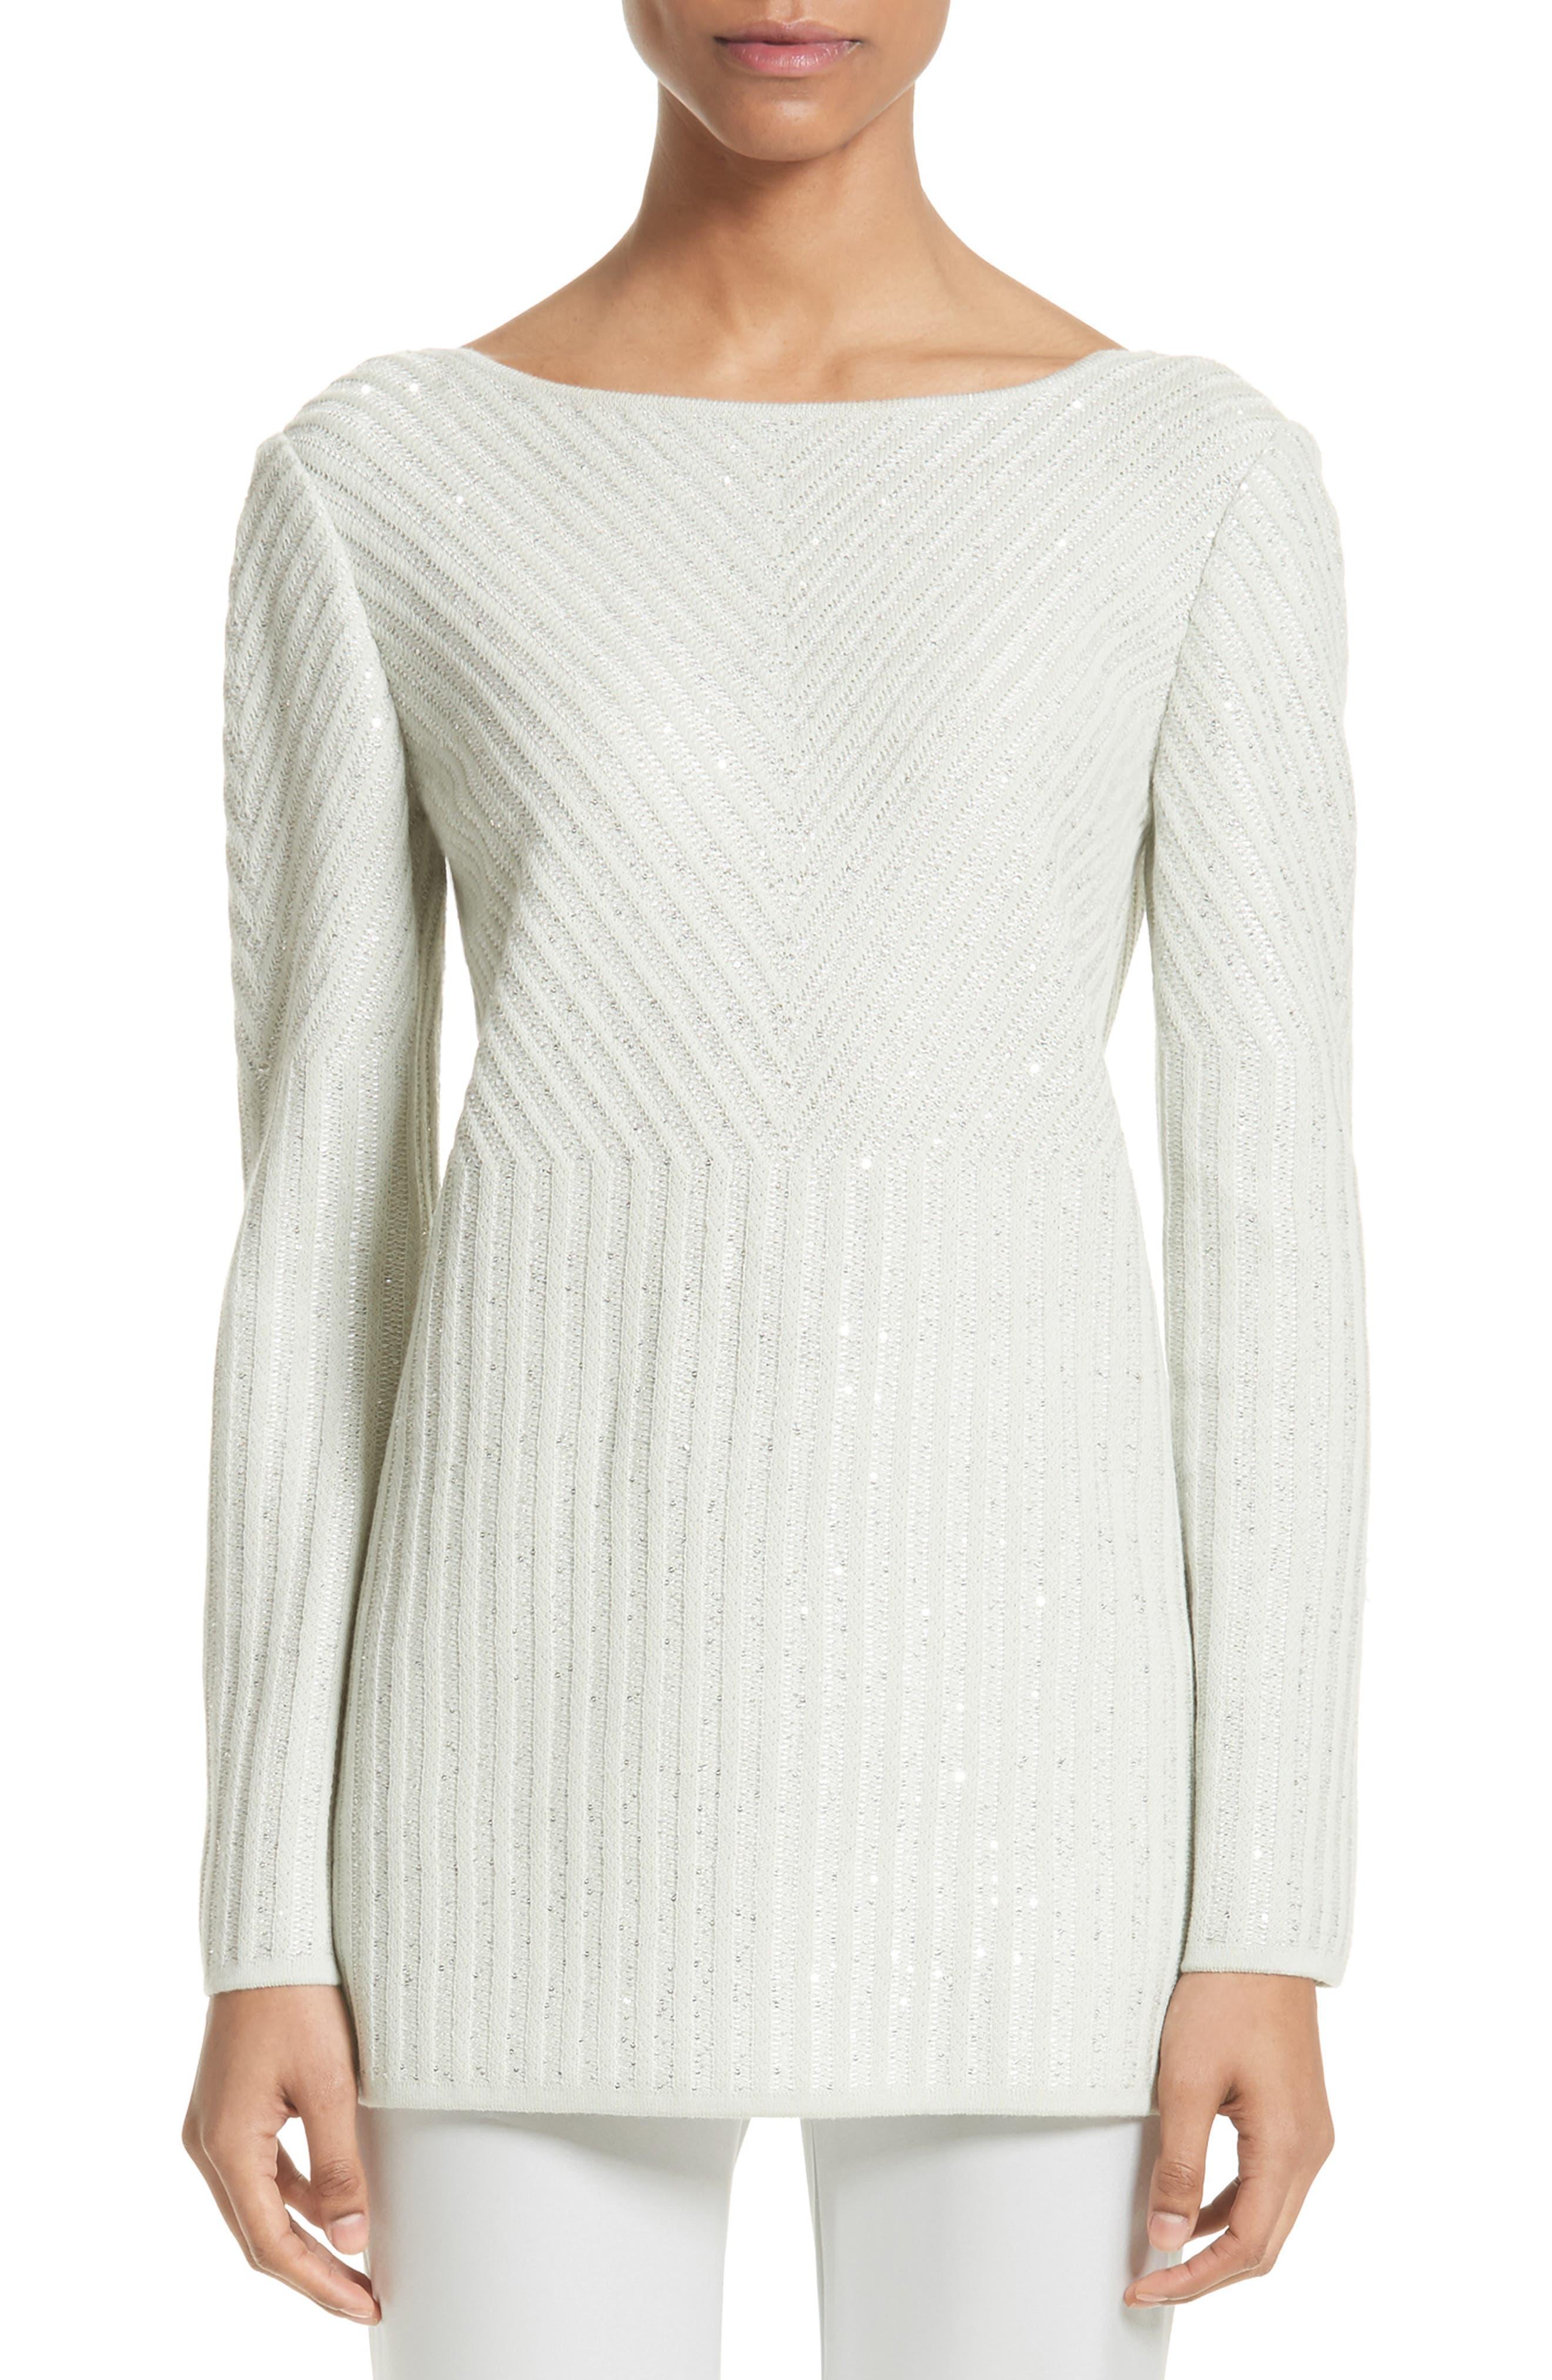 Main Image - St. John Collection Sparkle Engineered Rib Sweater